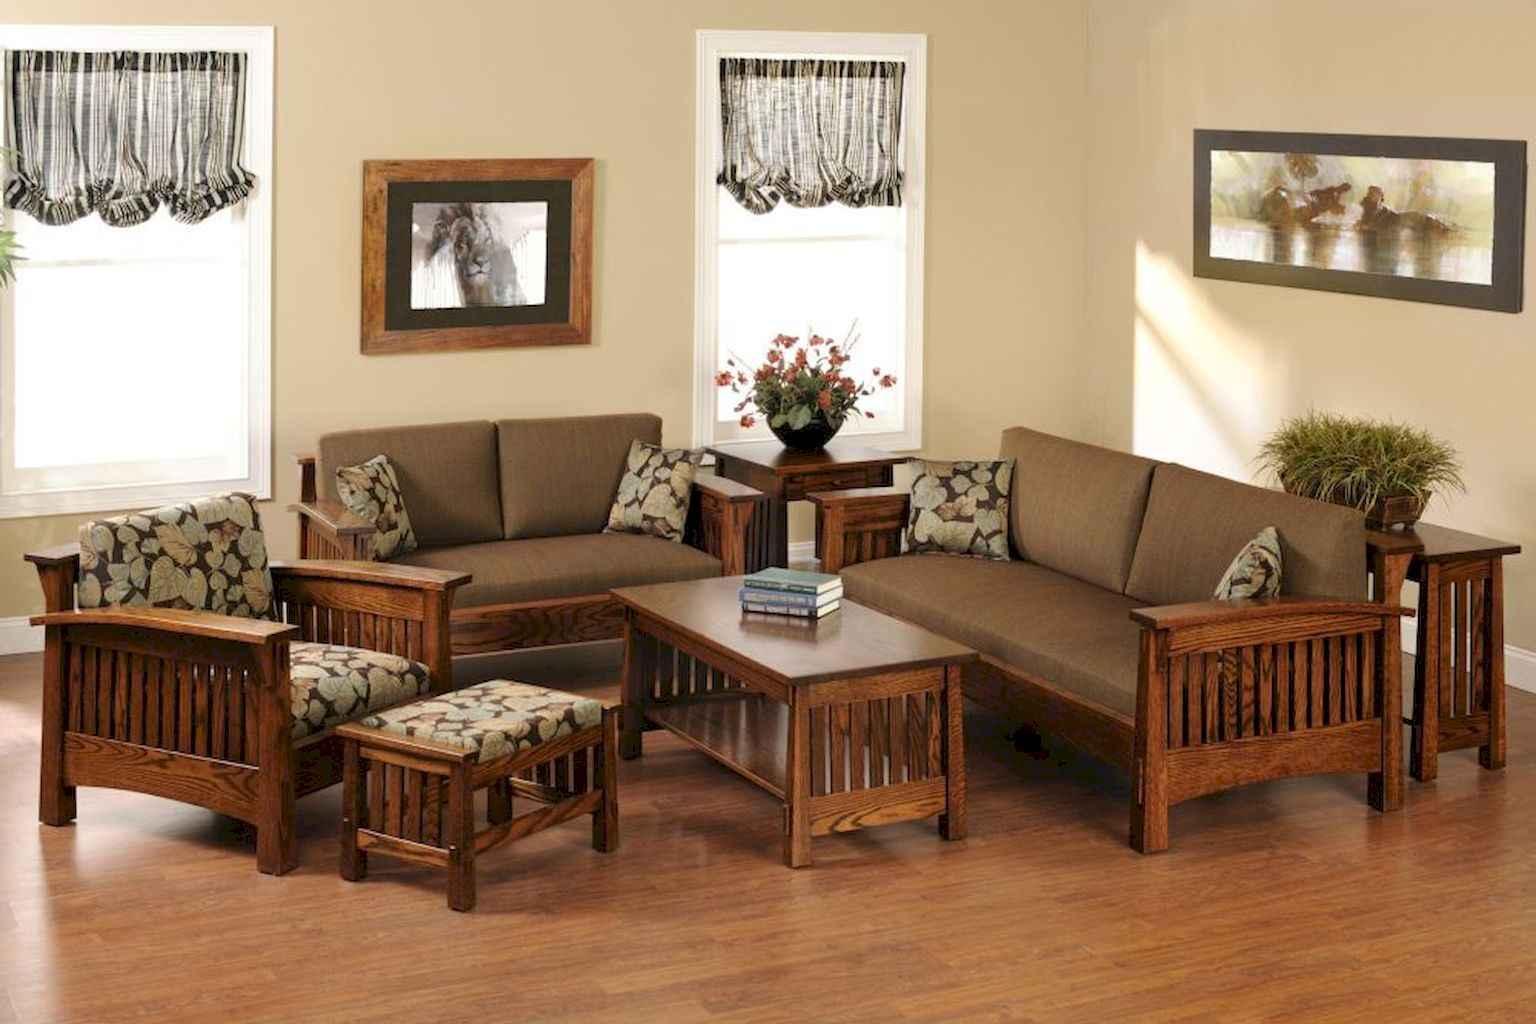 70 Rustic Farmhouse Living Room Decor Ideas (12)